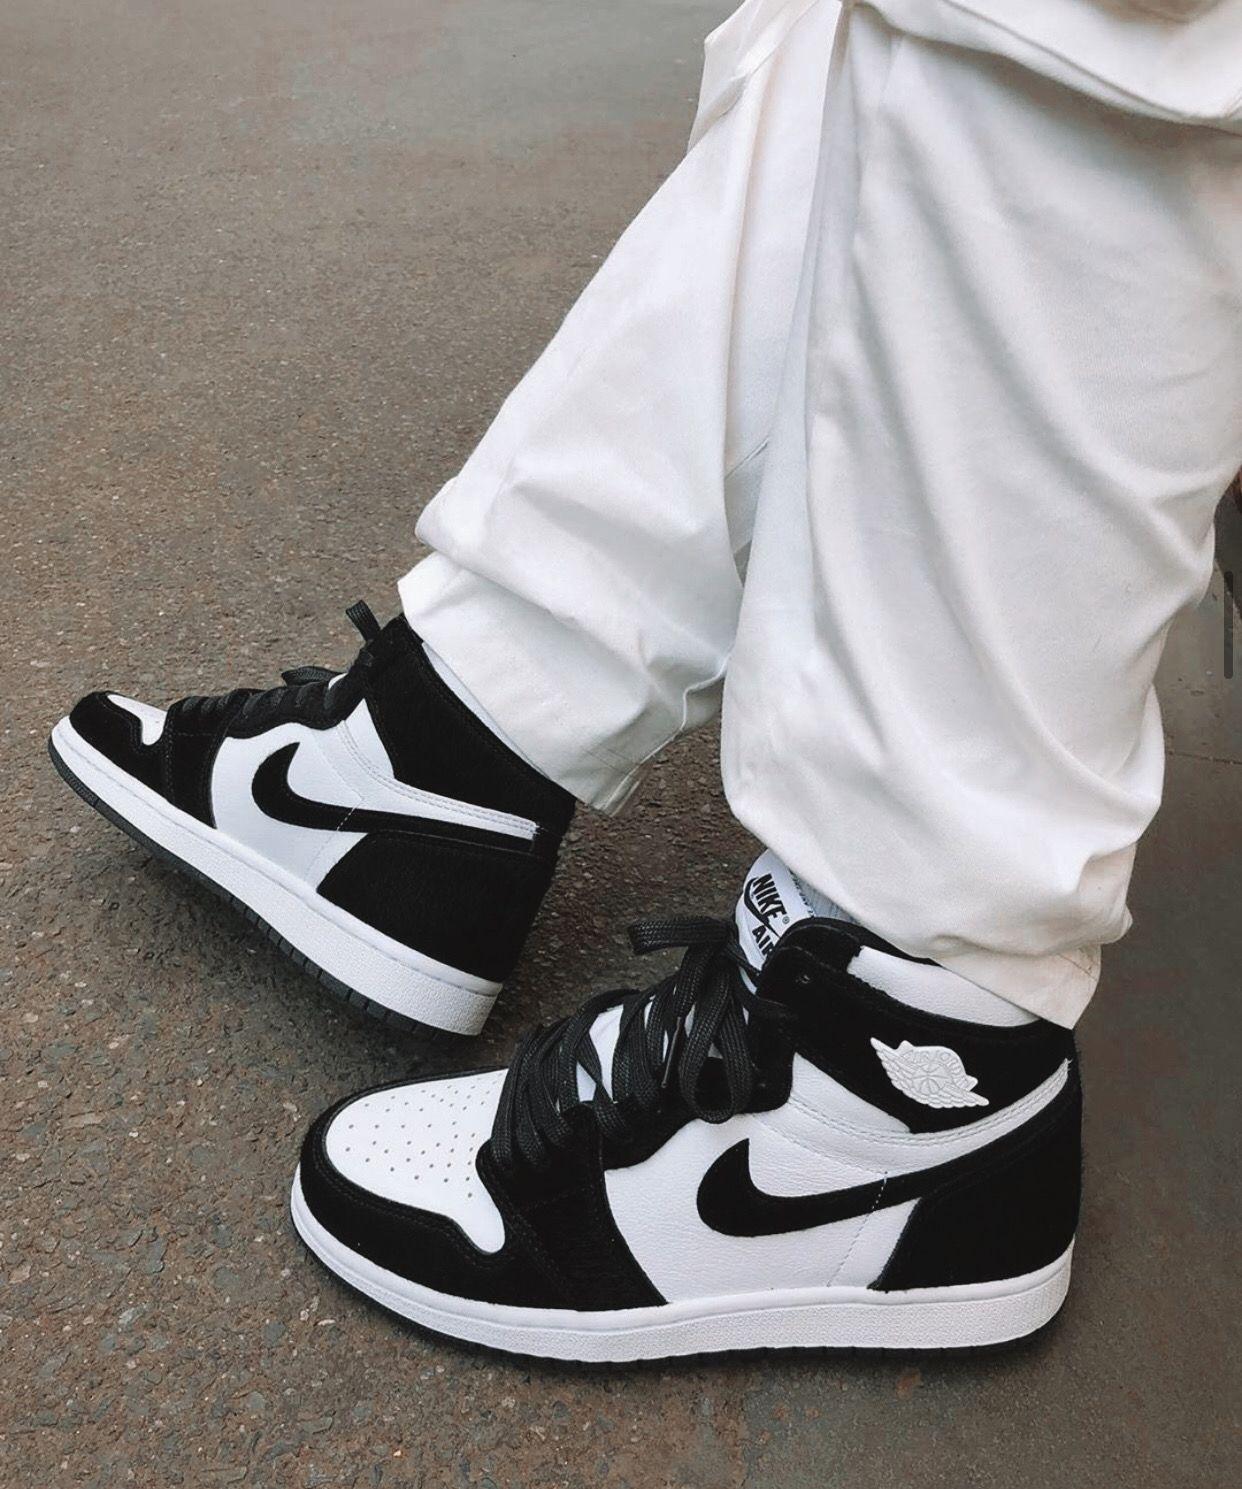 Air Jordan 1 Retro High OG Panda Twist | Chaussures noir et blanc ...